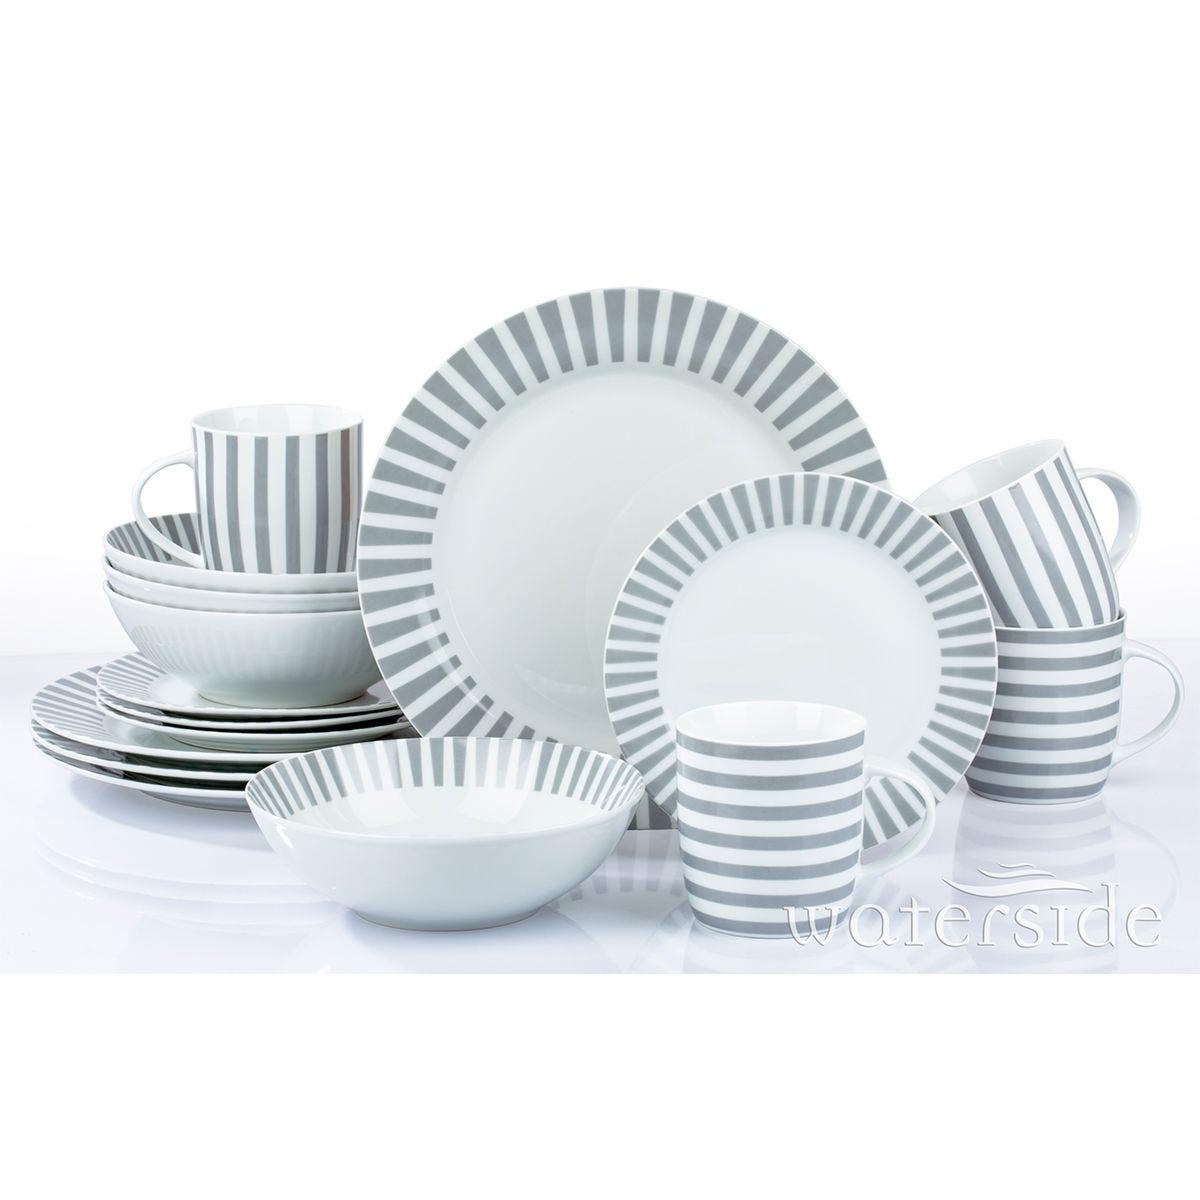 The Waterside 16 Piece Grey Stripe Dinner Set